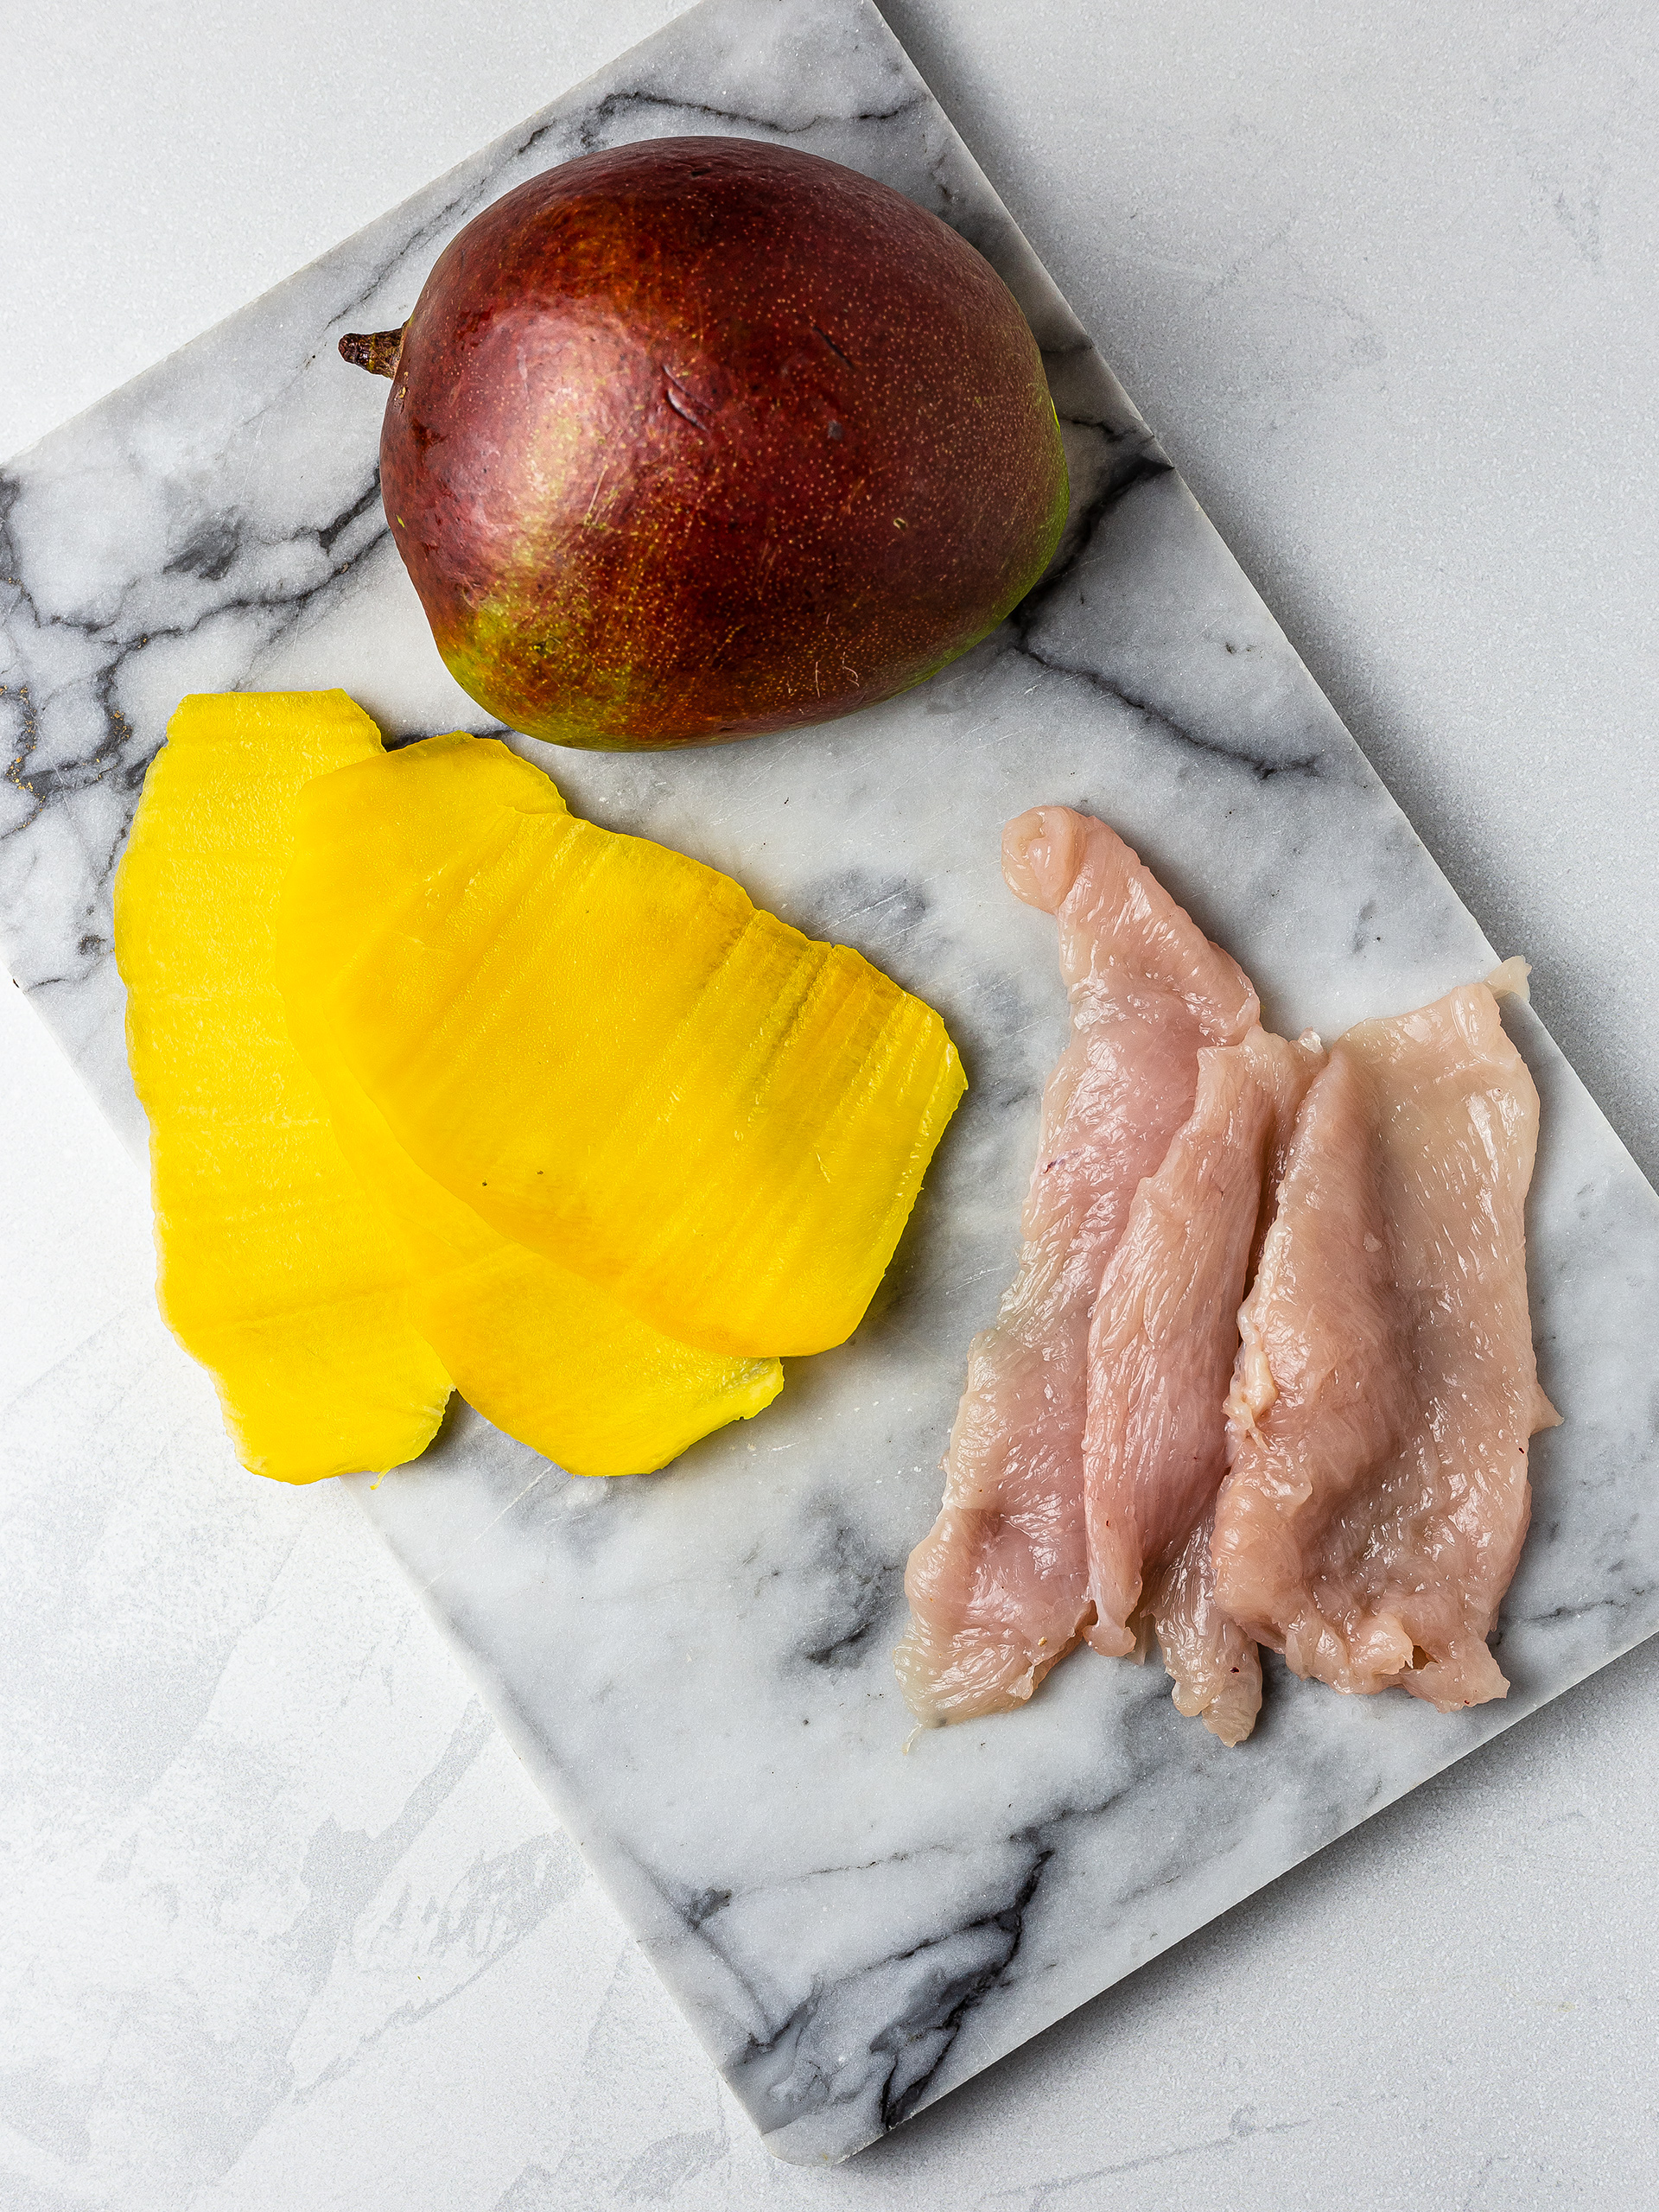 Sliced mango and chicken breast